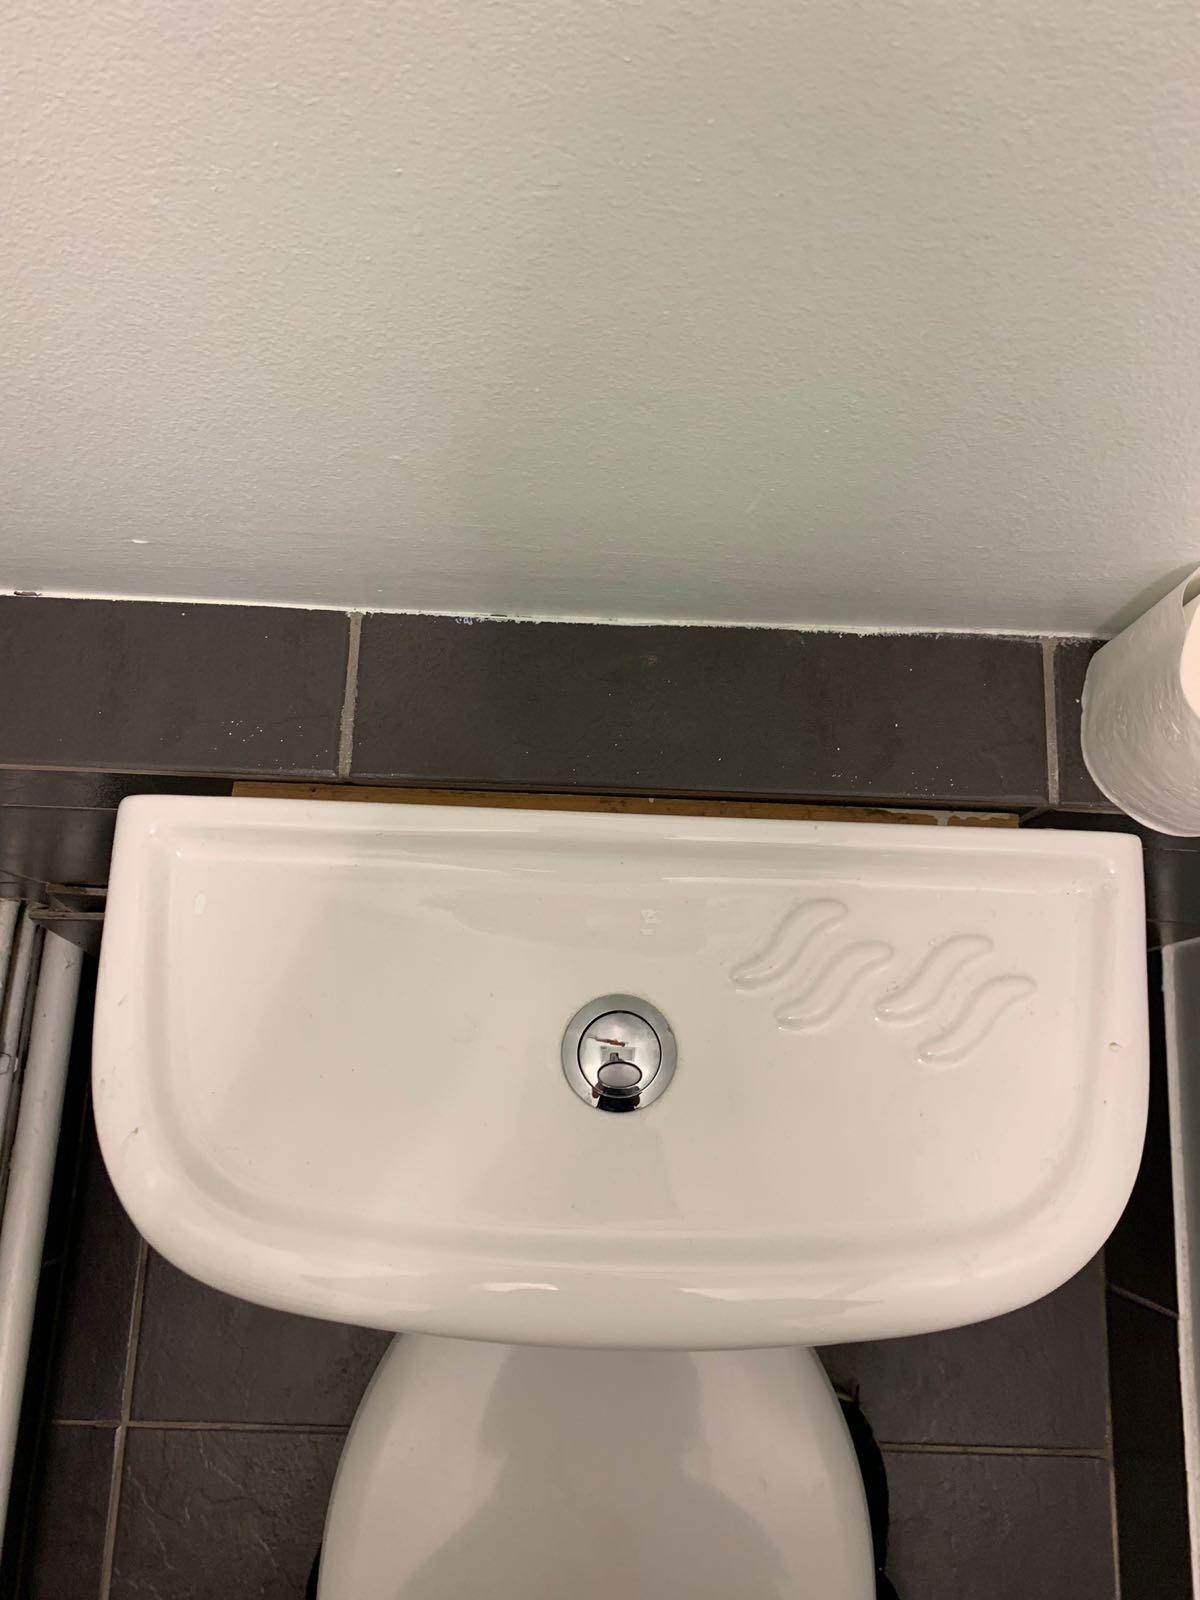 Heating-Plumbing-Gallery-169